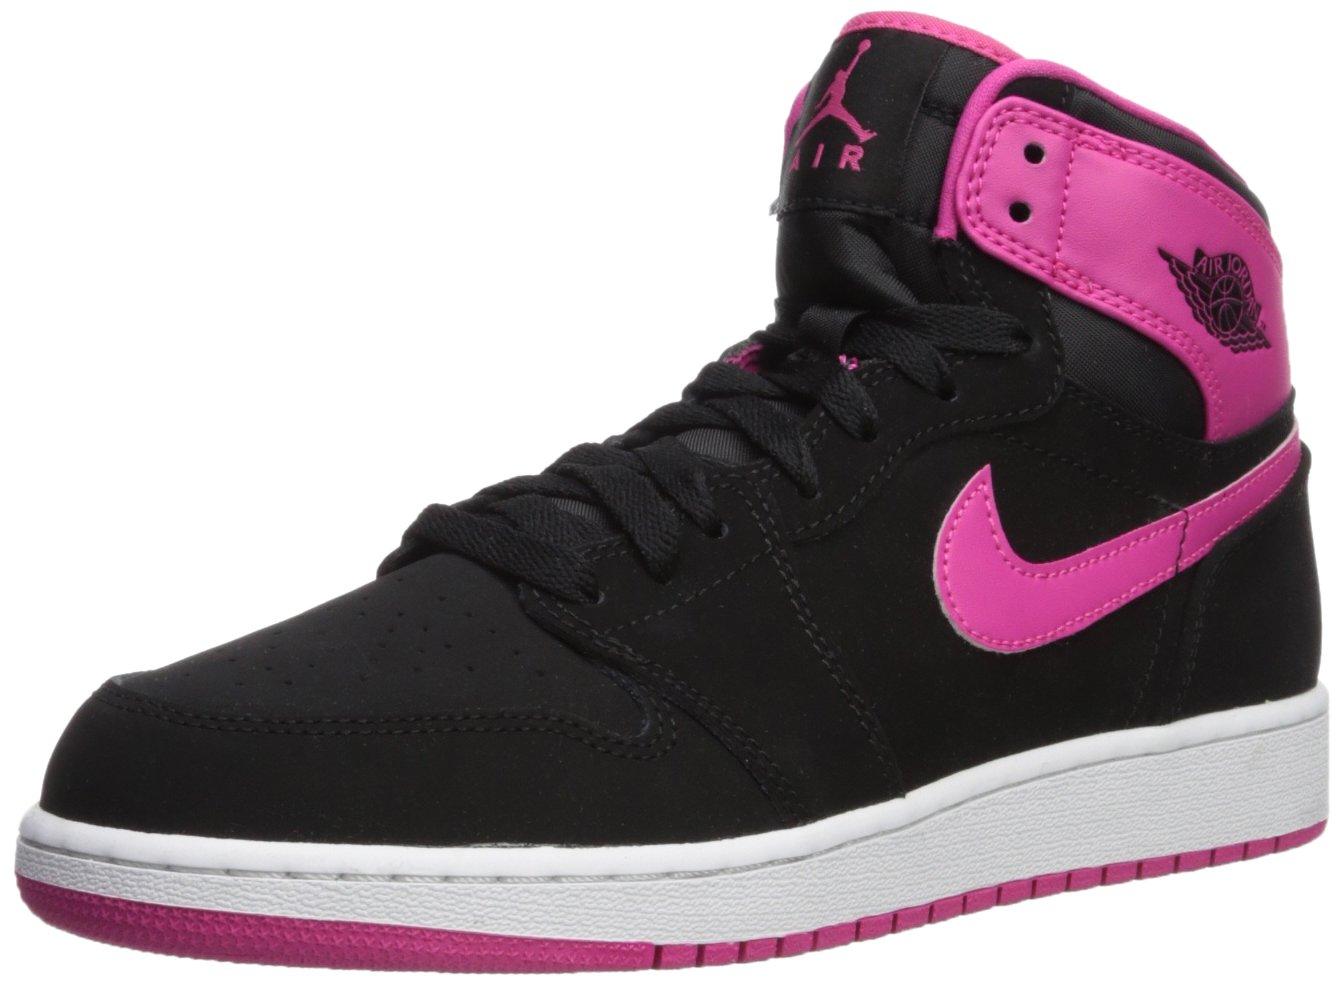 31c671284bf43 ... pink air jordan 31s tonight b2e5b 2477d; best jordan kids air 1 retro  high gg 771a0 f51ea